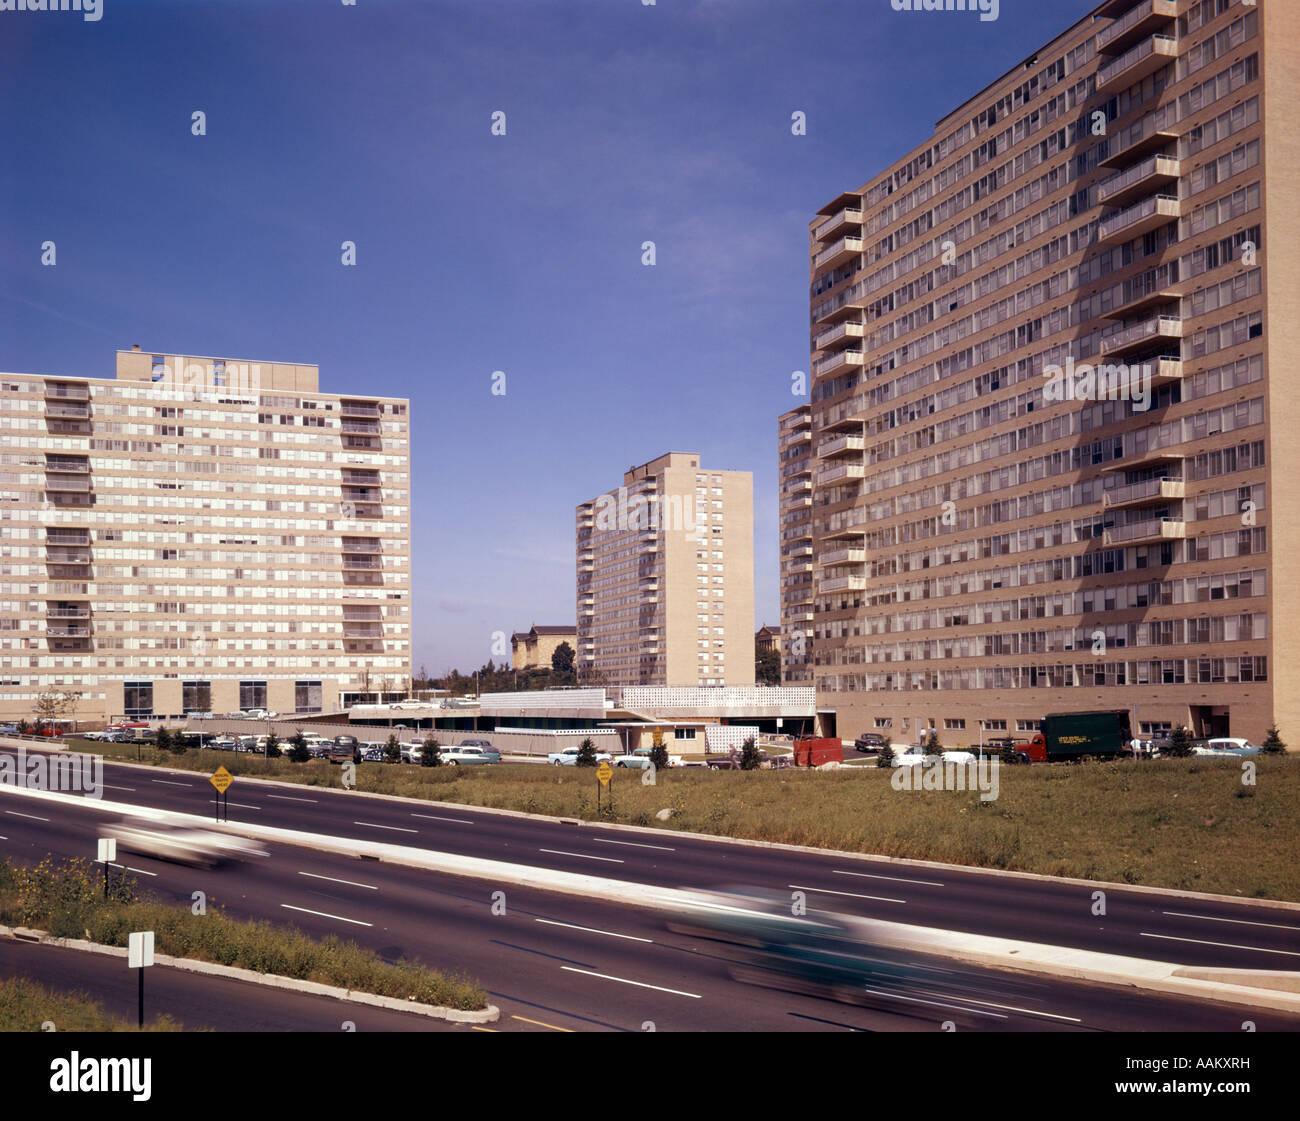 1950s 1960s PHILADELPHIA APARTMENT BUILDINGS SPRING GARDEN